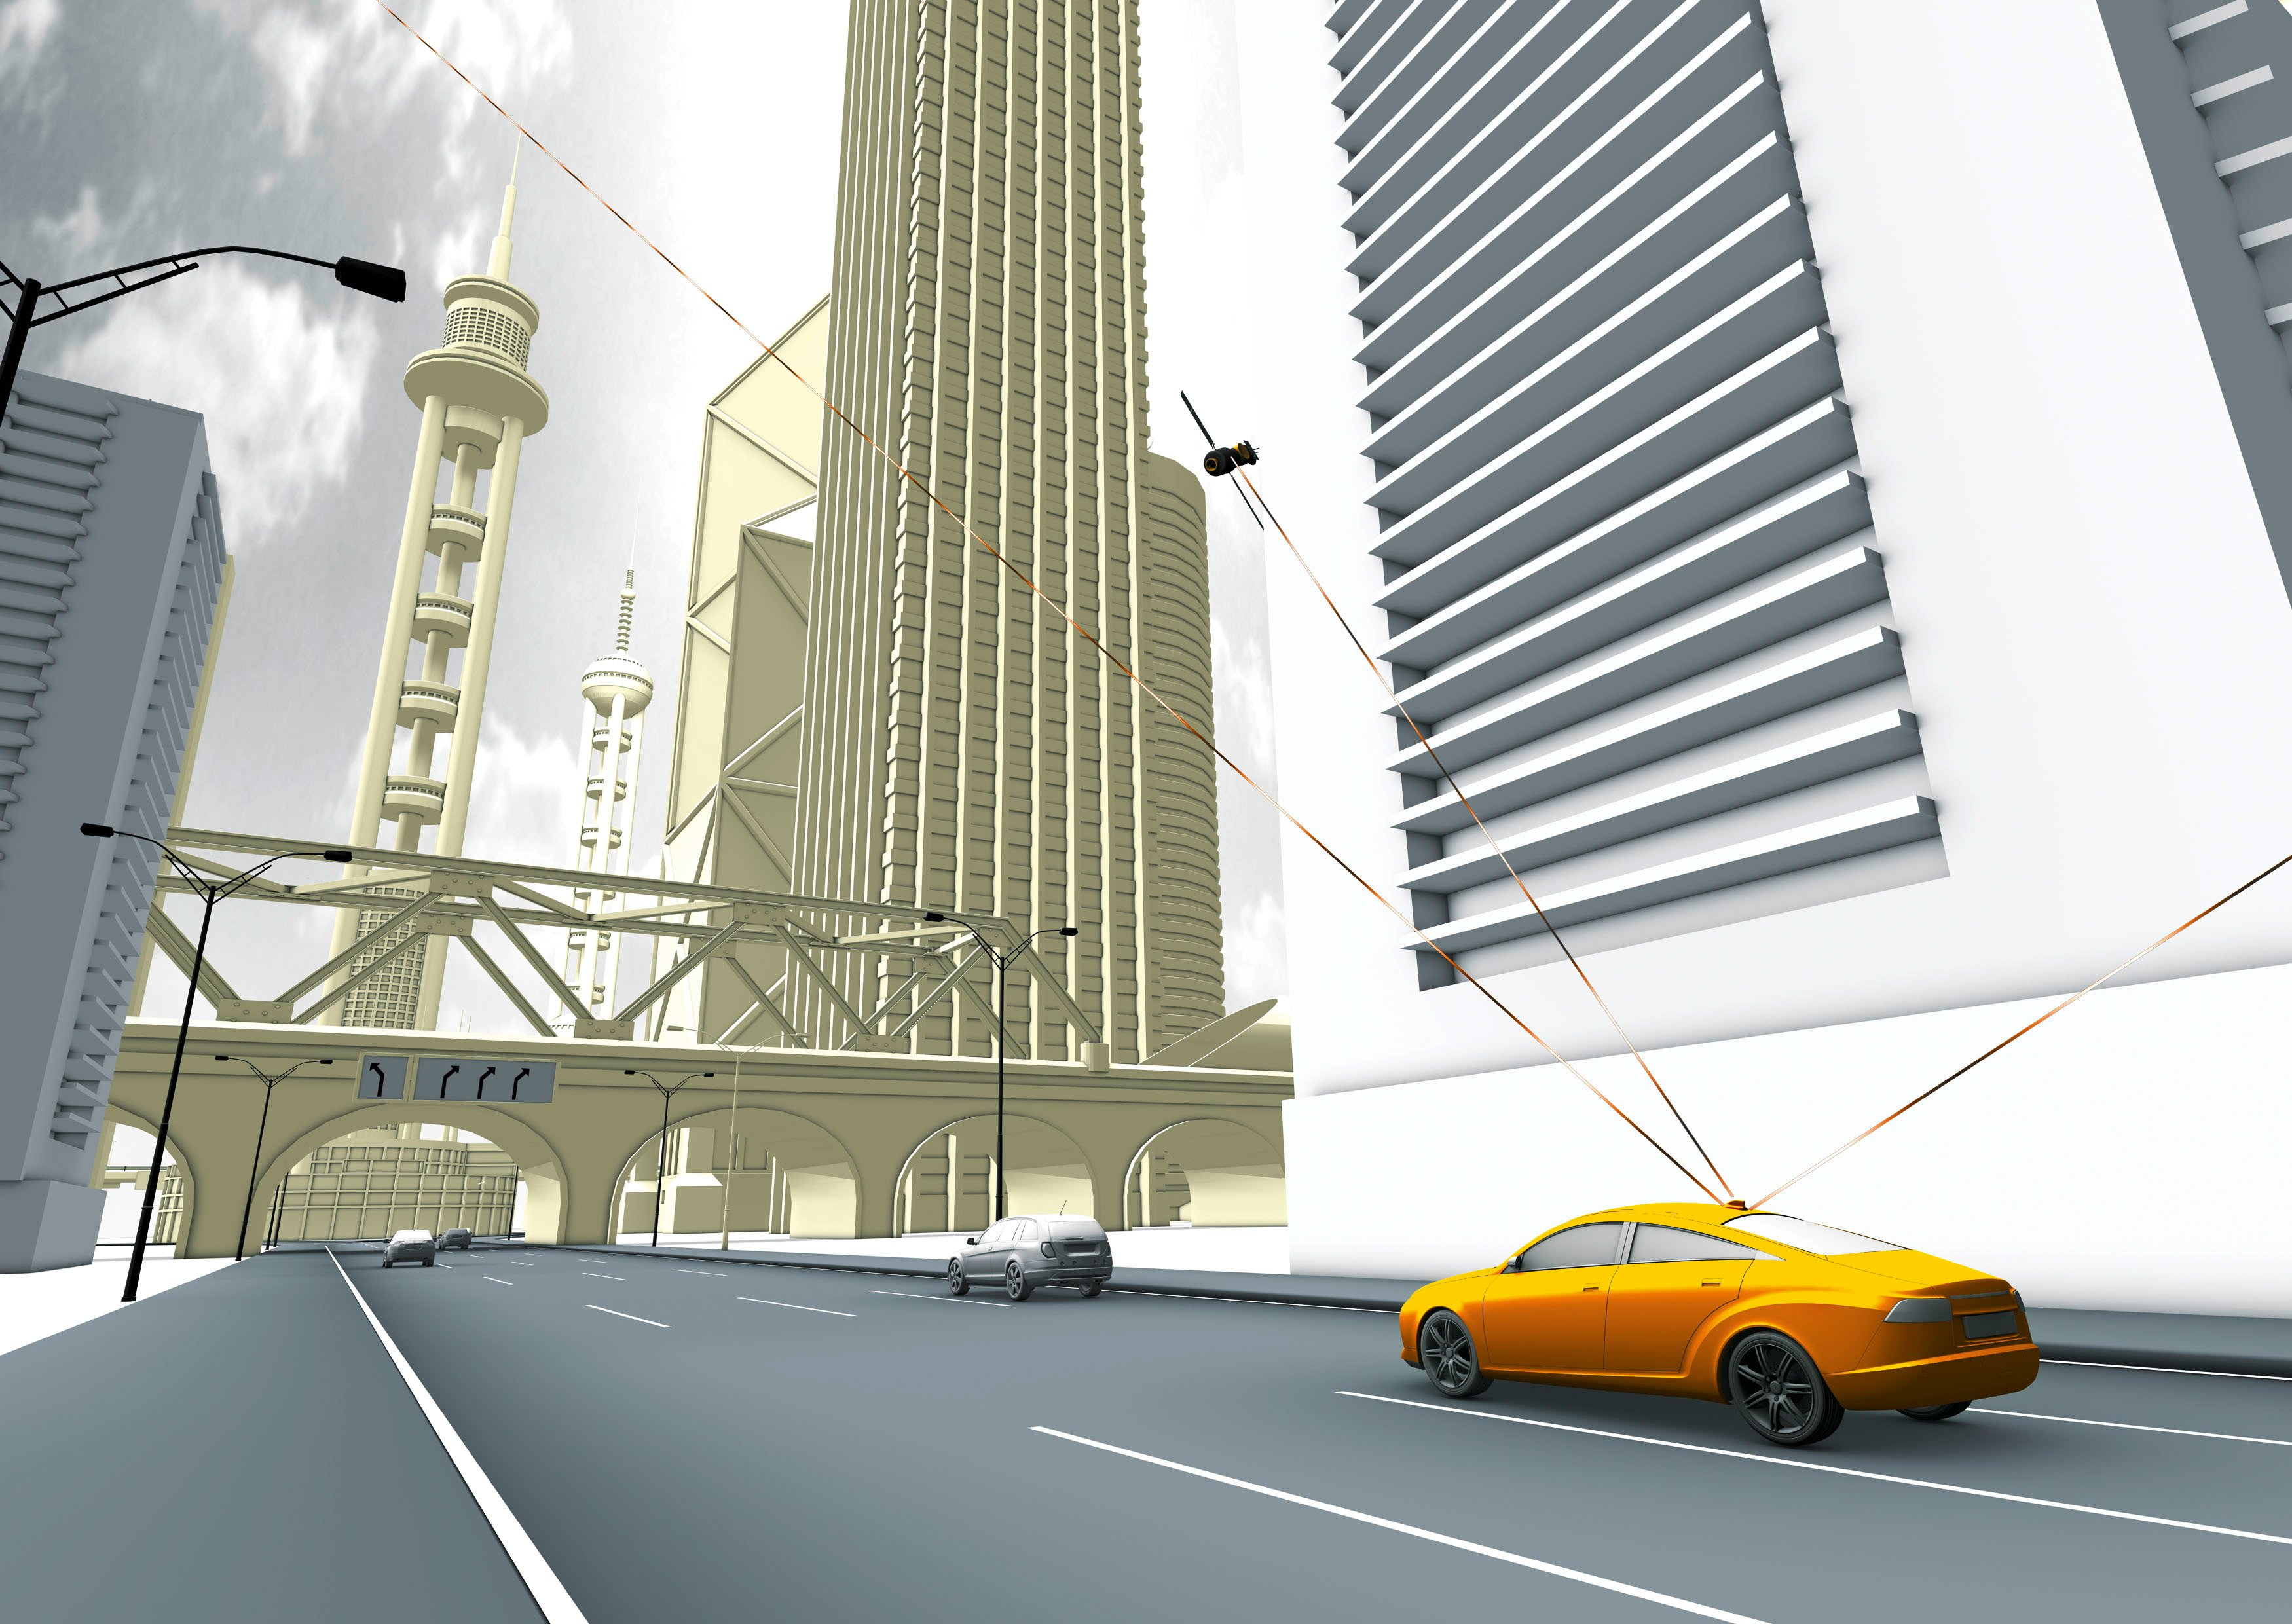 Daimler Test Fleet Exploring Potential of Car-to-X Communication